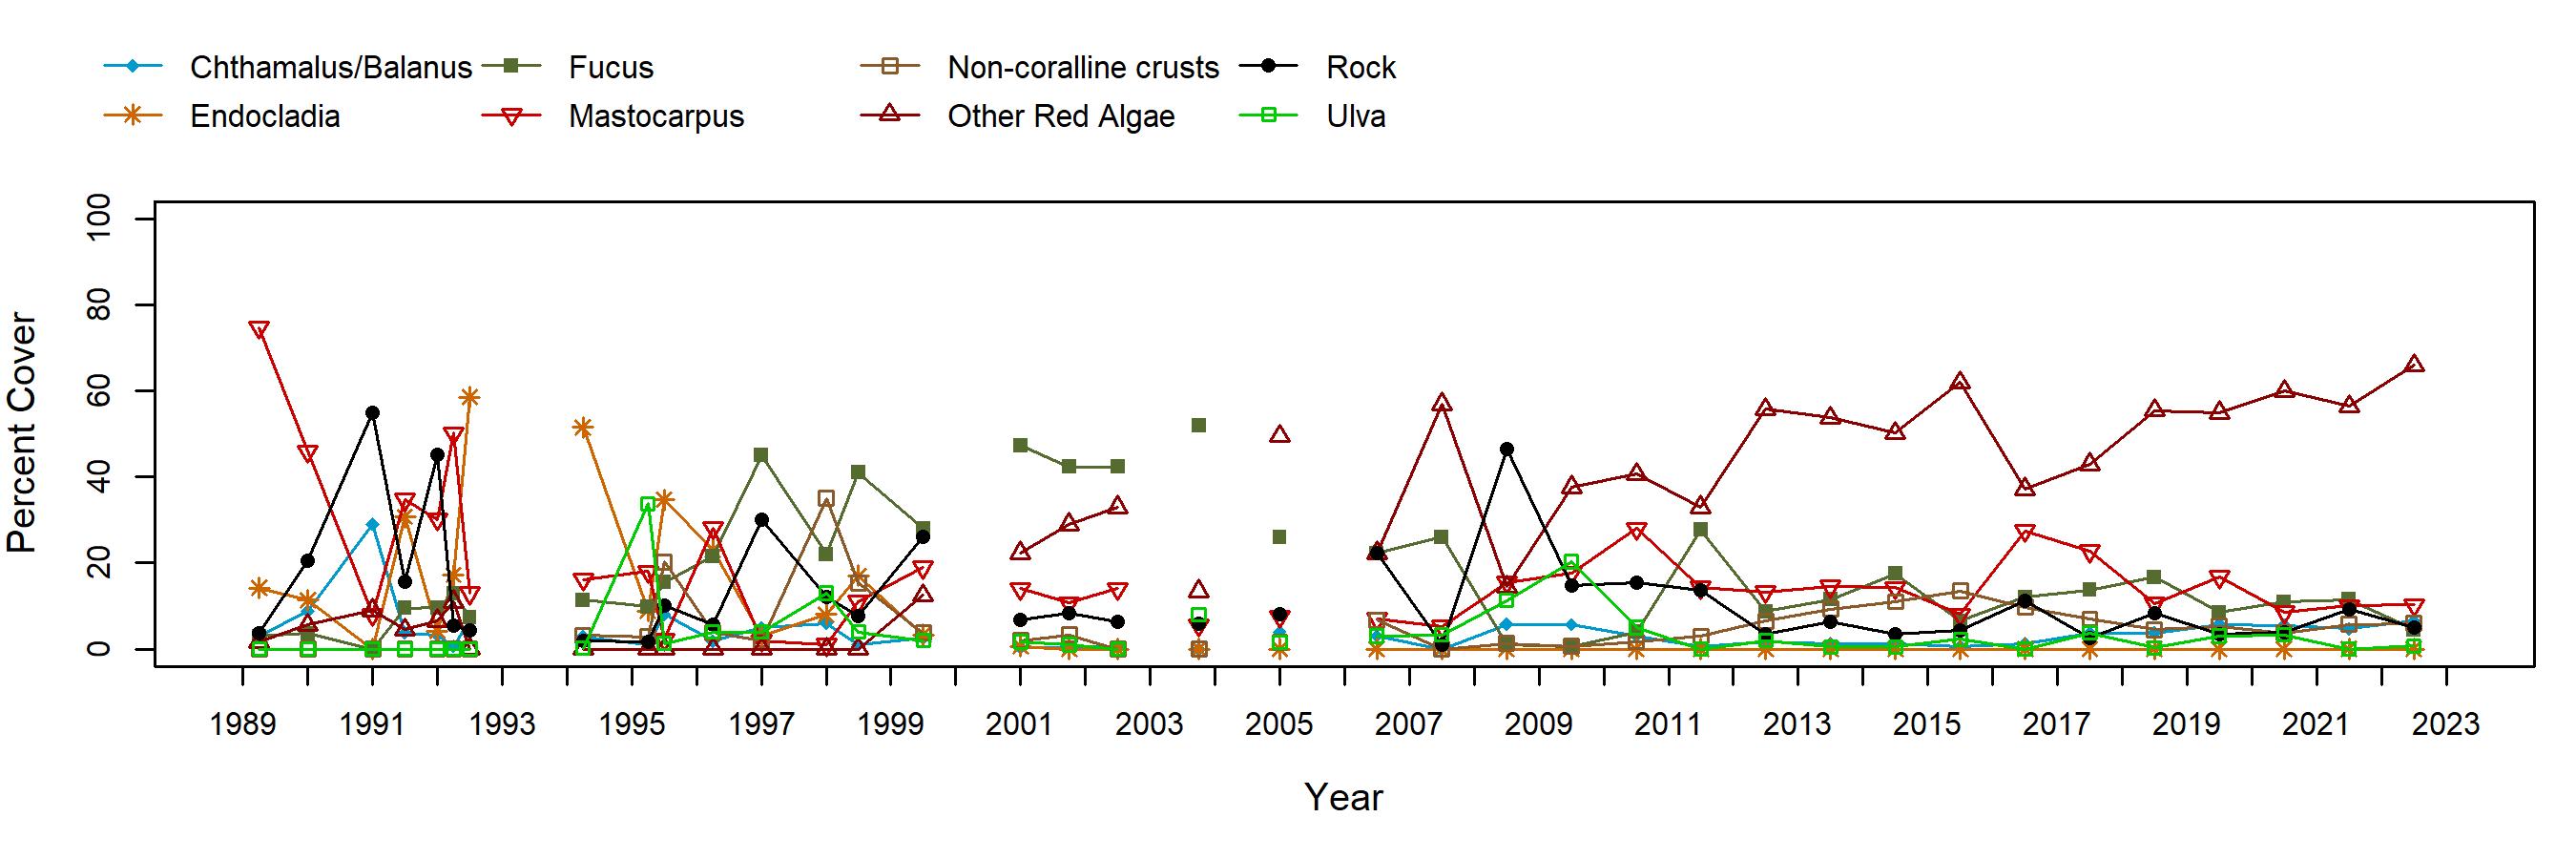 Alcatraz Mastocarpus trend plot